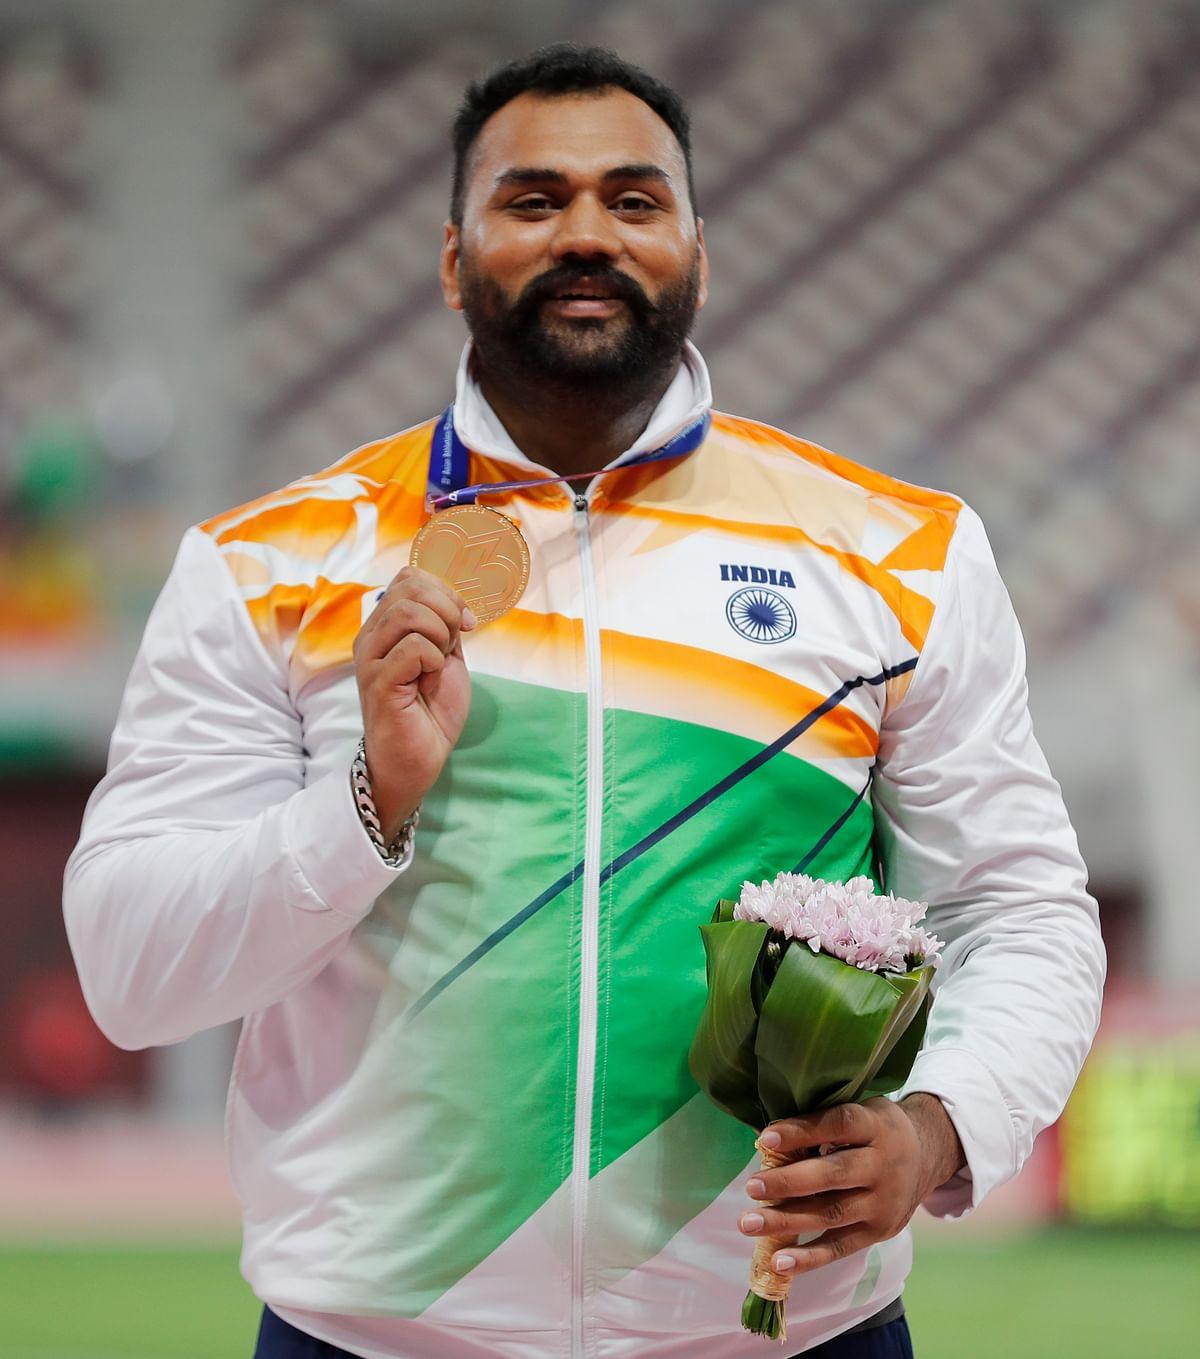 Tejinderpal Singh Toor celebrates after winning the gold medal.